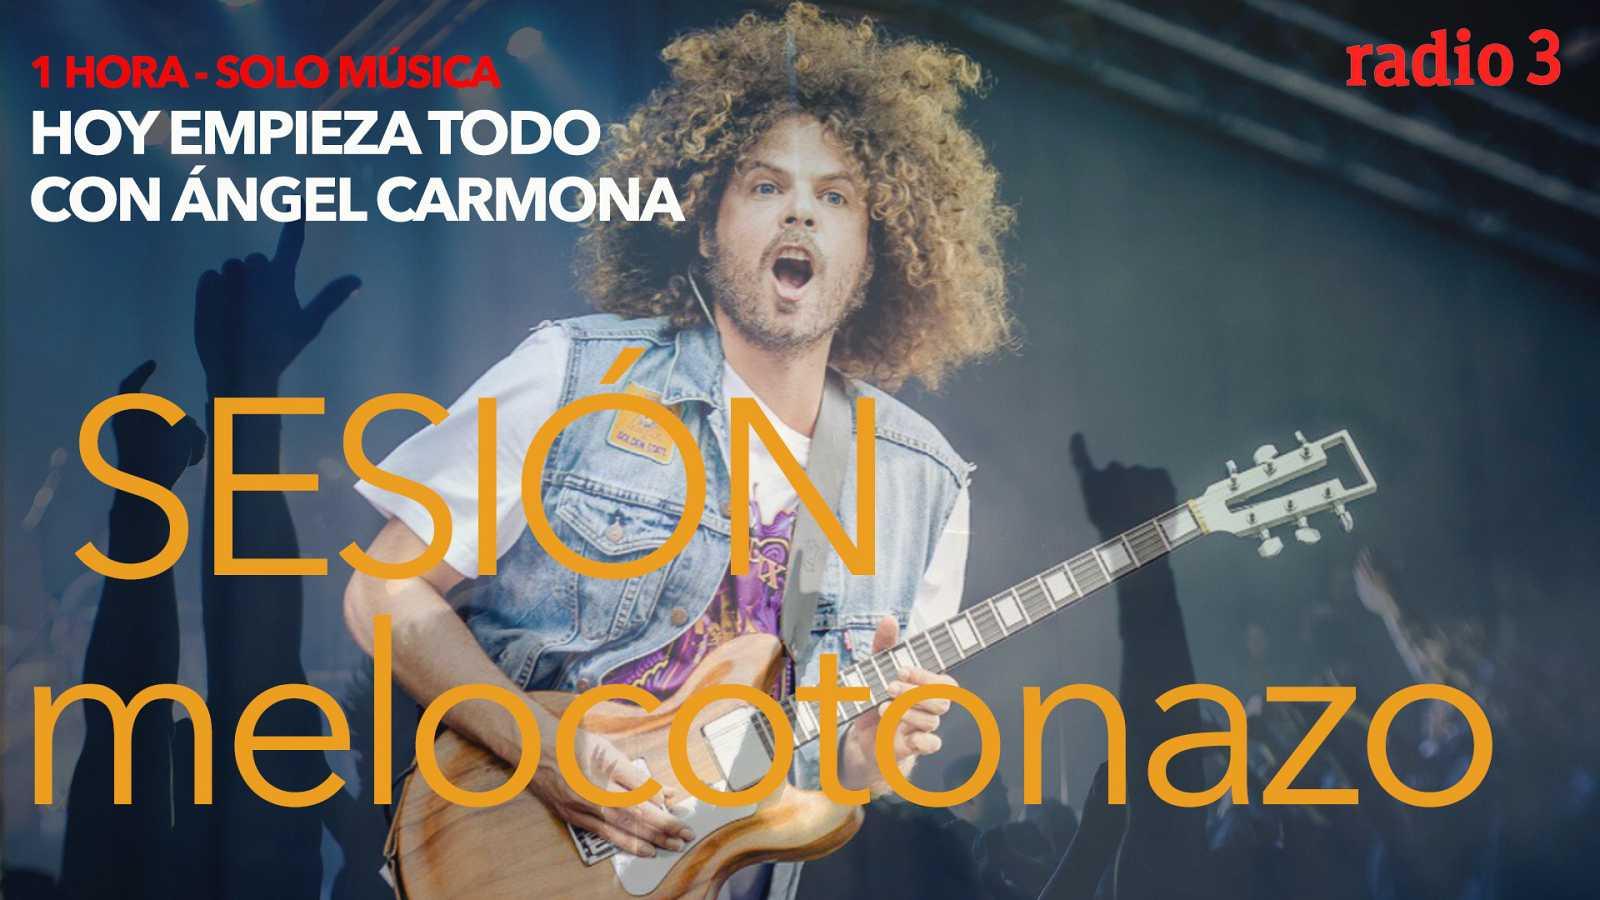 "Hoy empieza todo con Ángel Carmona - ""#SesiónMelocotonazo"": Tina Turner, Wolfmother, Billie Eilish... - 26/11/20 - escuchar ahora"